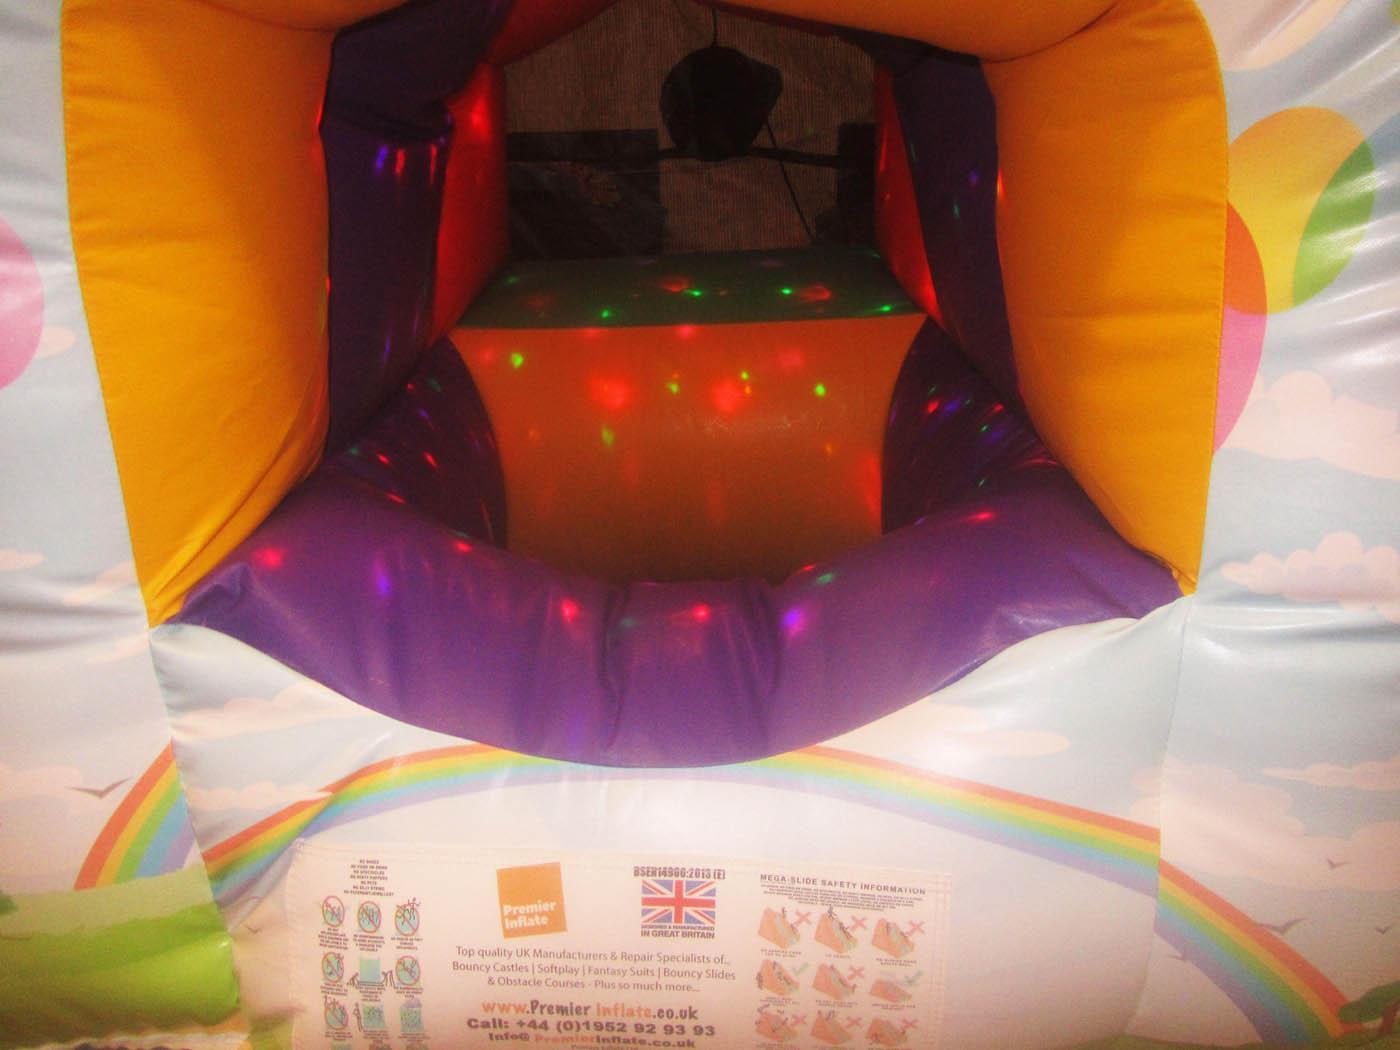 Inside of a Sensory Soft Play Dome